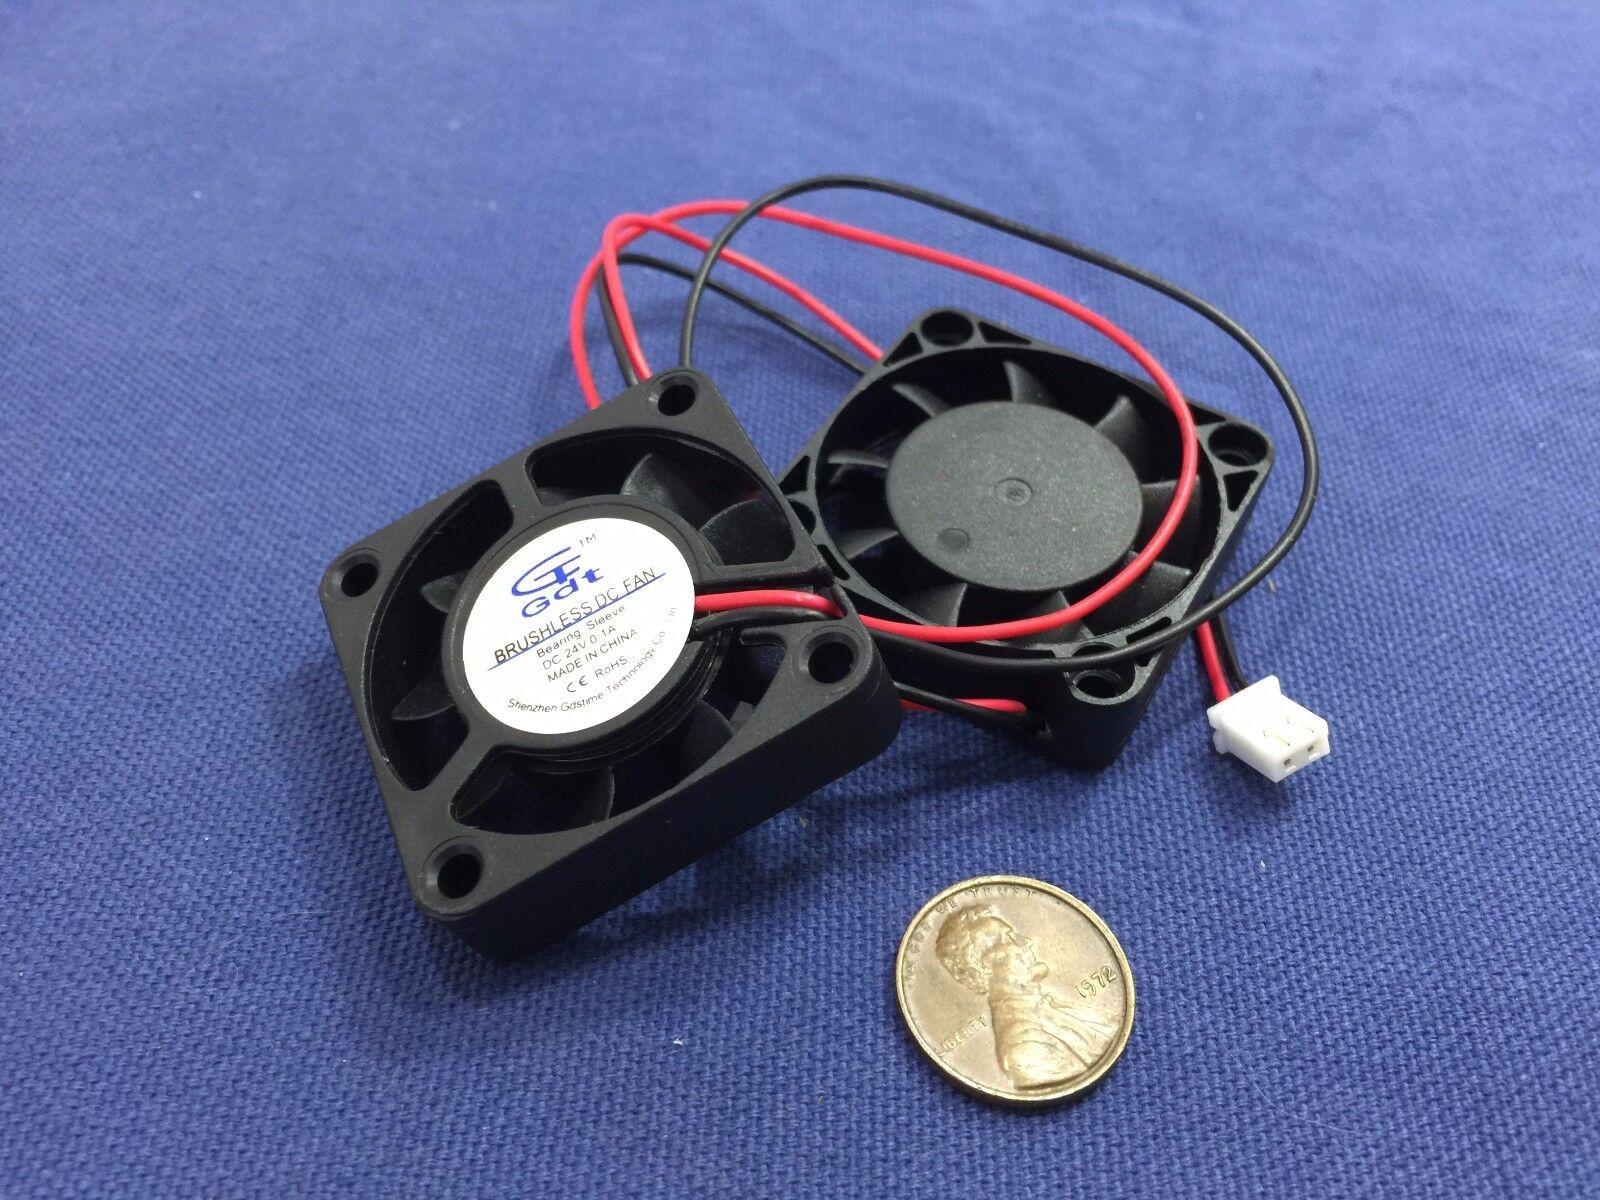 2 pcs 4010 Fan 24V 40x10 40mm reprap Dual Extruder Cooling USA 3d printer B20